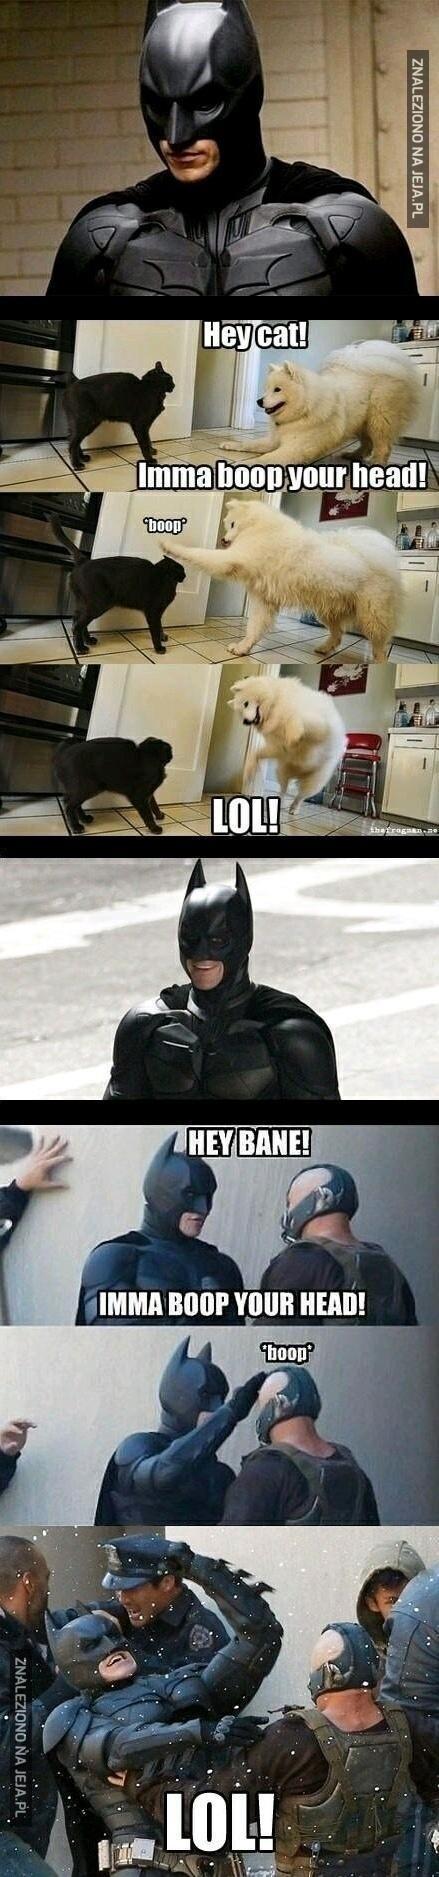 Dowcipniś Batman